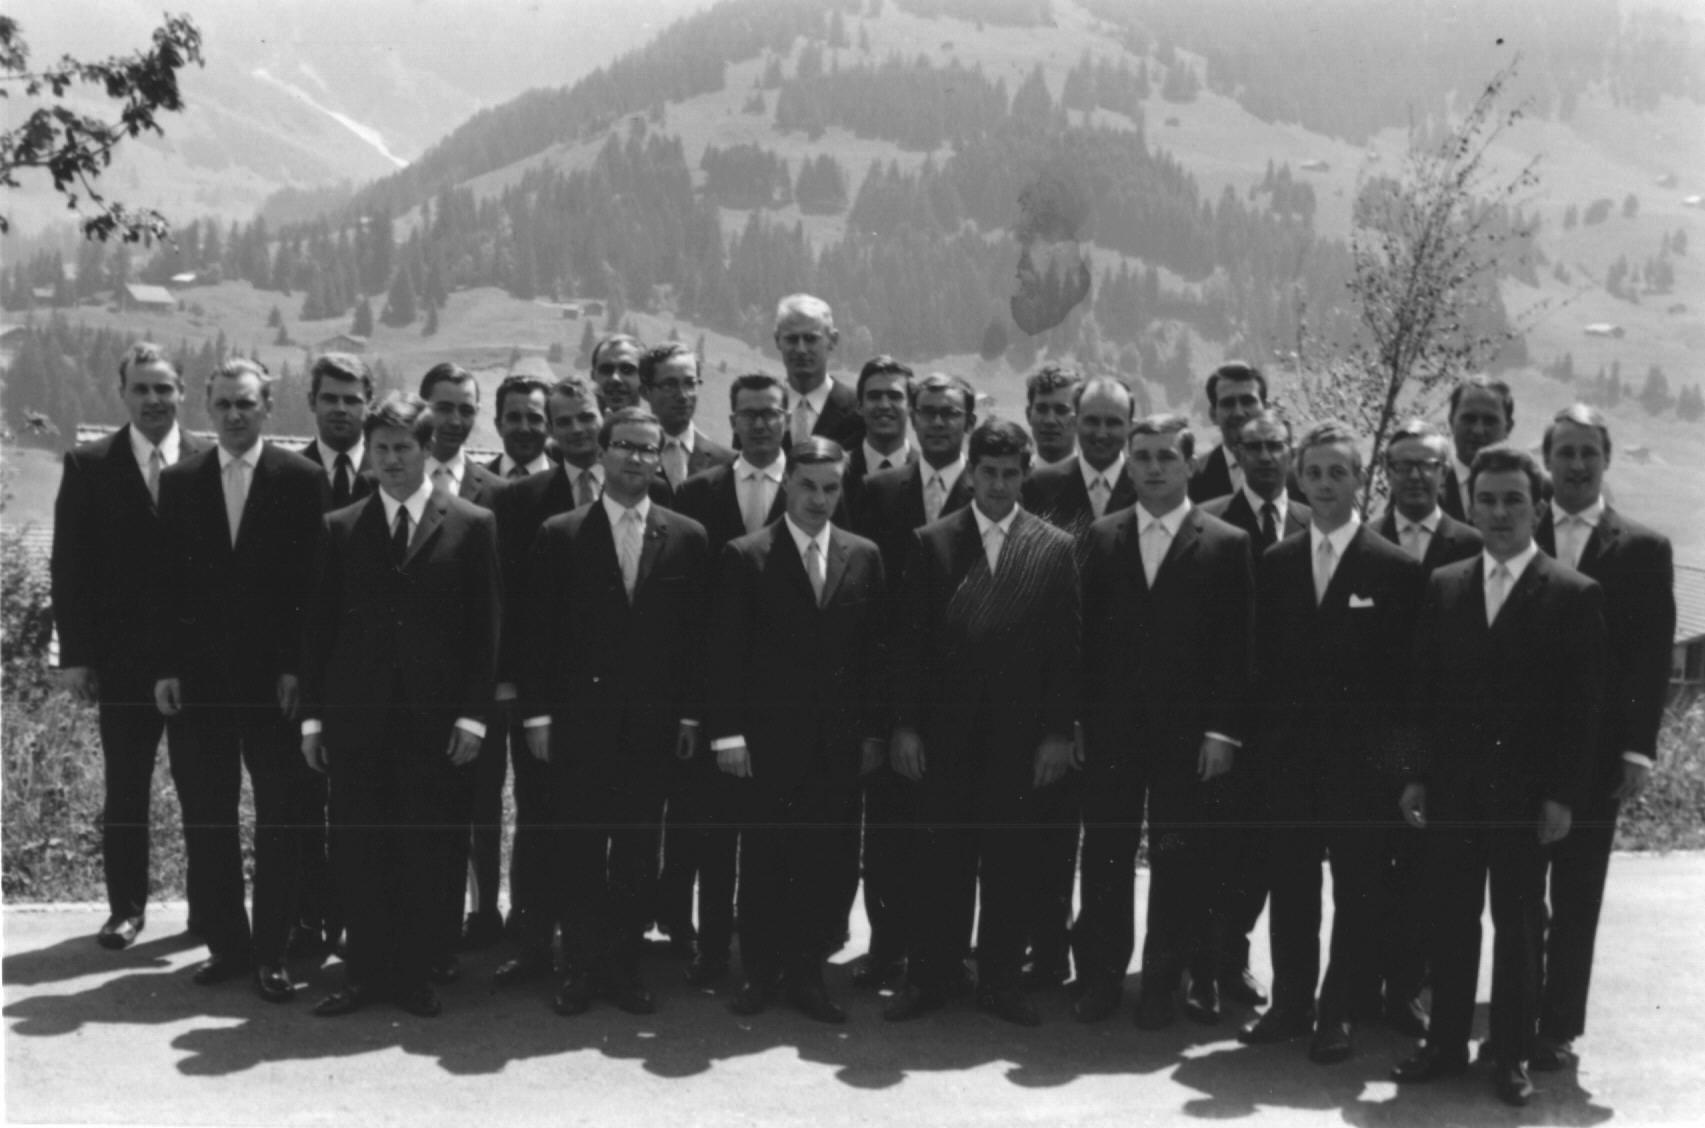 tsc-Abschlussklasse 1969 in Adelboden